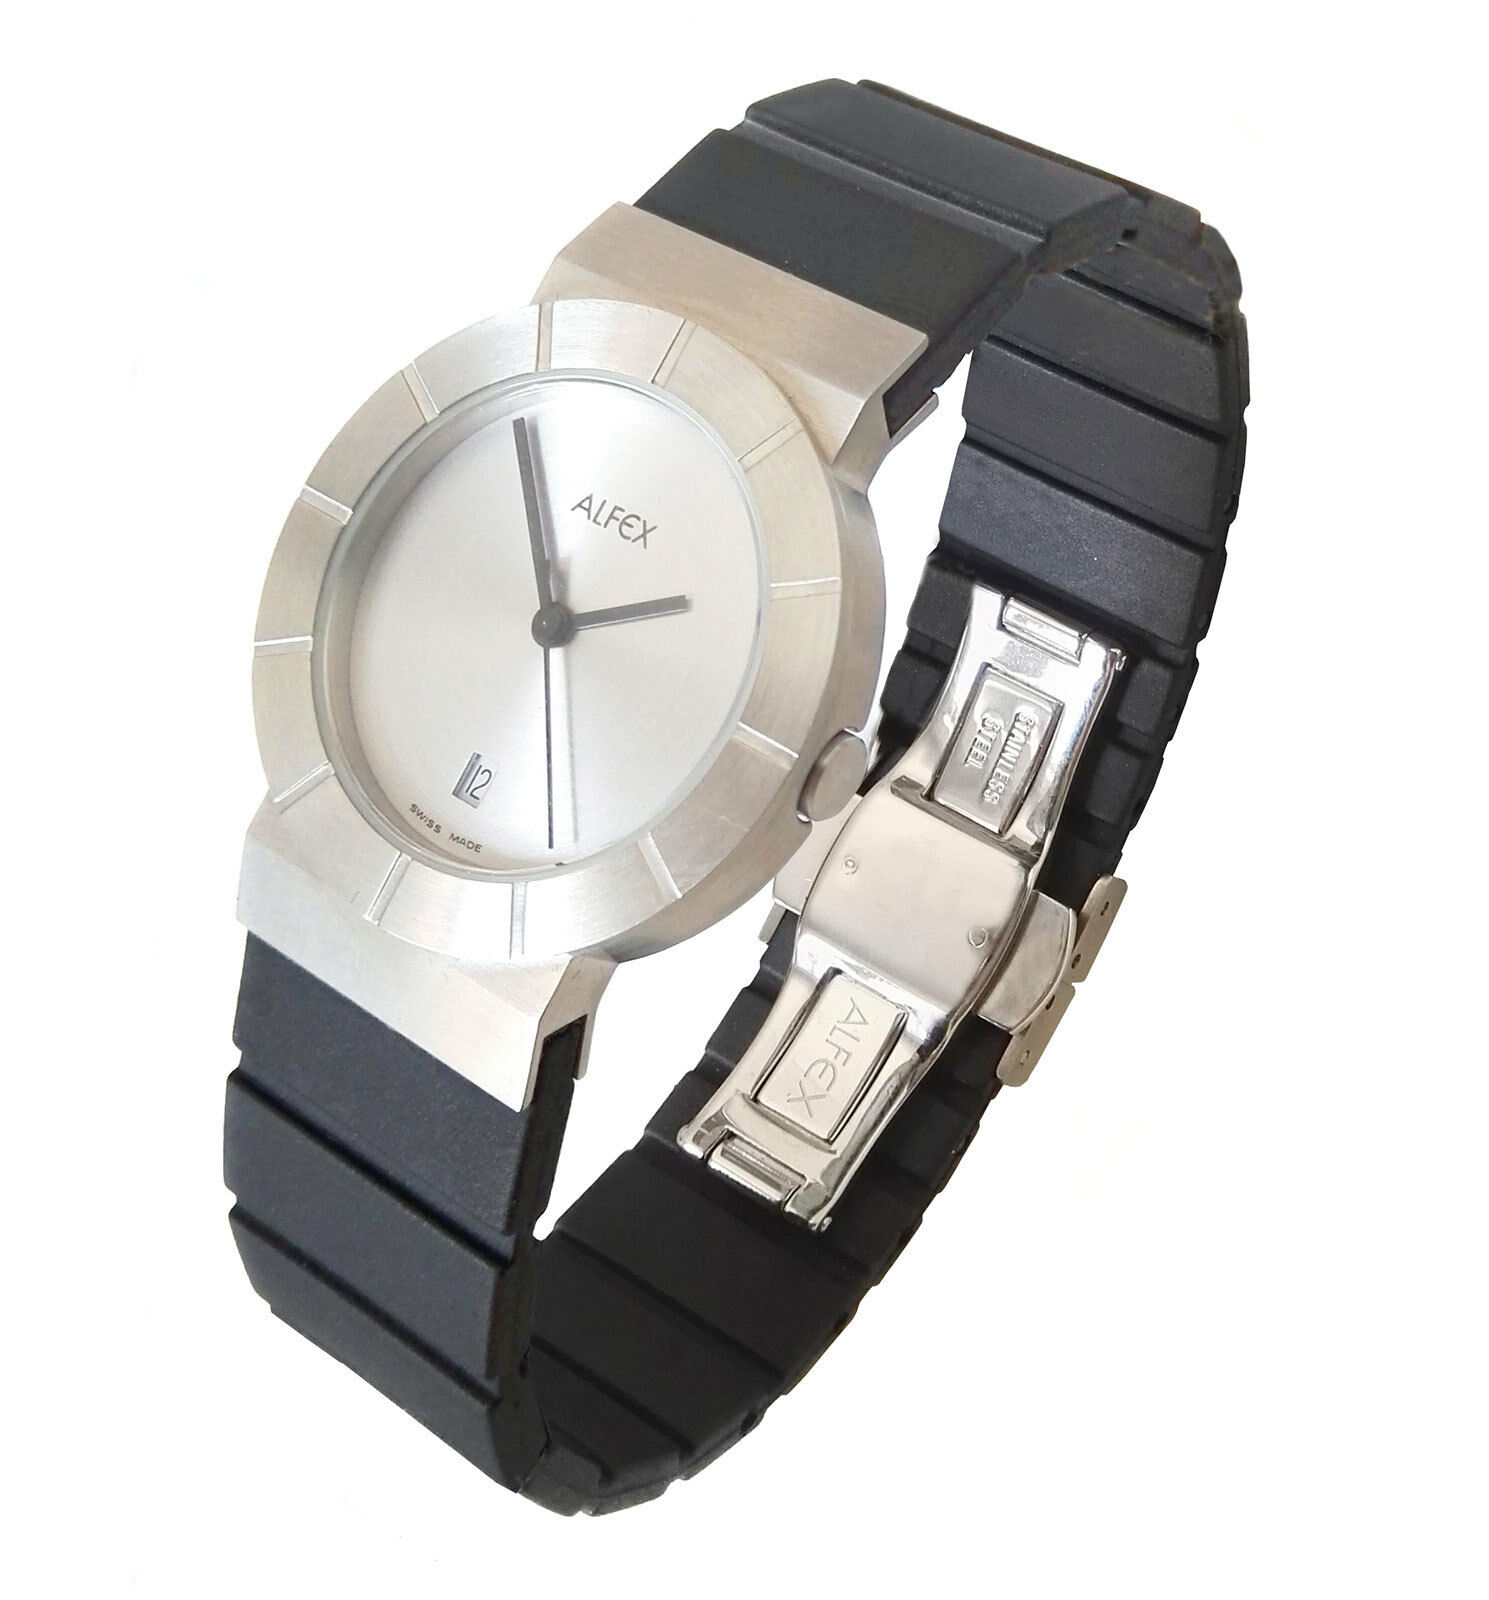 3bd240a0d46 Alfex 5441-01 woman swiss watch  90s - Georg Plum design - aldosuebai.  Woman wristwach with stainless steel ...